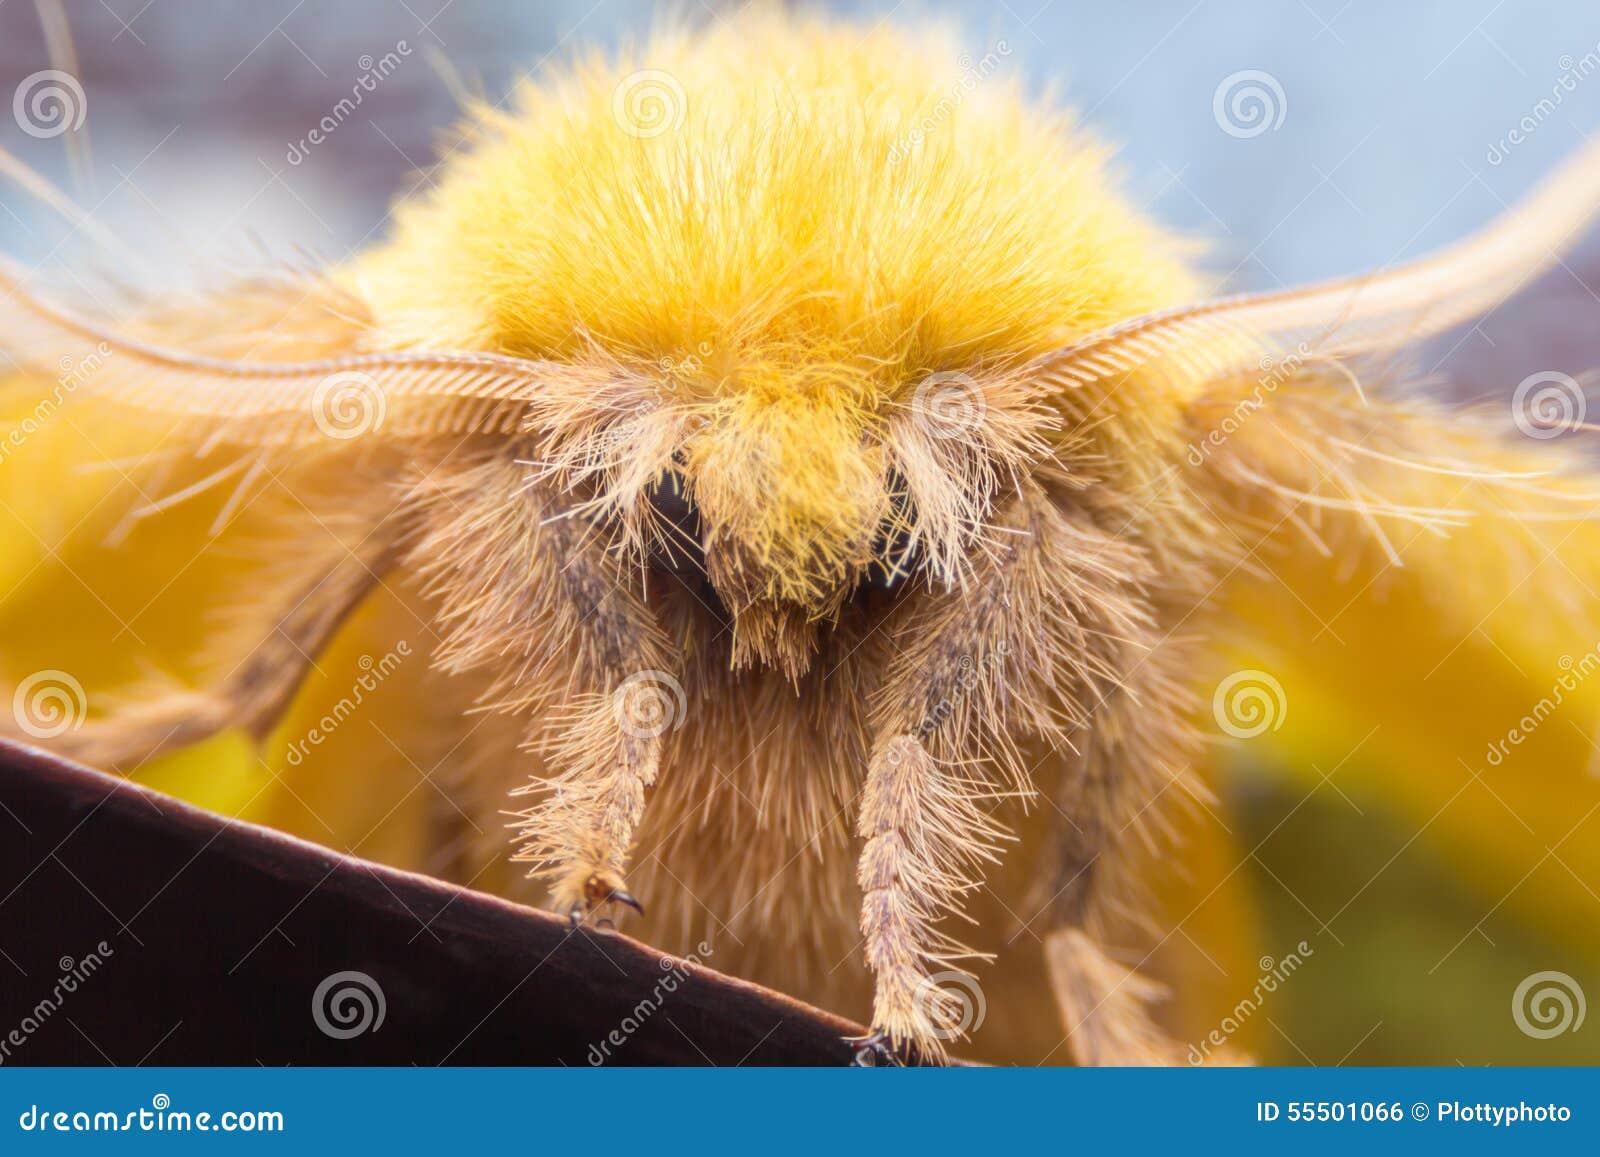 Sưu tập Bộ cánh vẩy  - Page 16 Lappet-moth-female-trabala-viridana-lasiocampidae-macro-shot-55501066